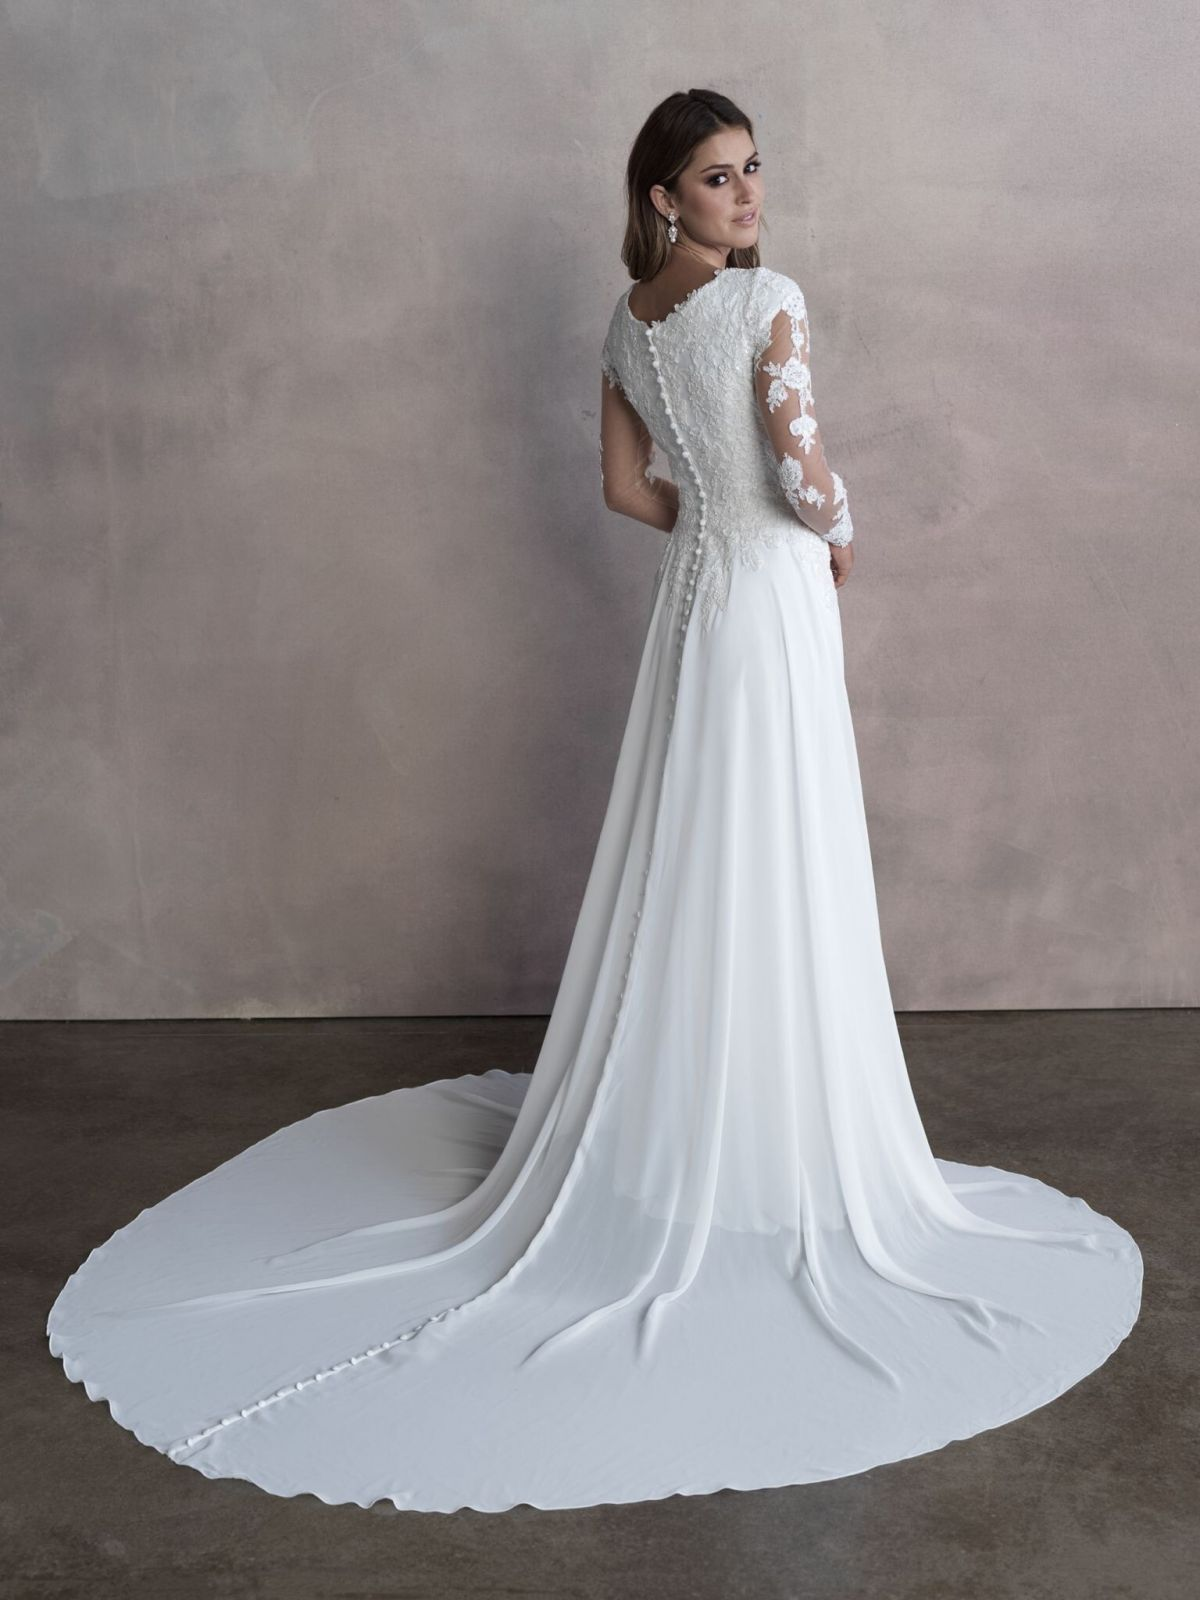 Gigi Paris - Allure Bridals 2020 Collection photoshoot